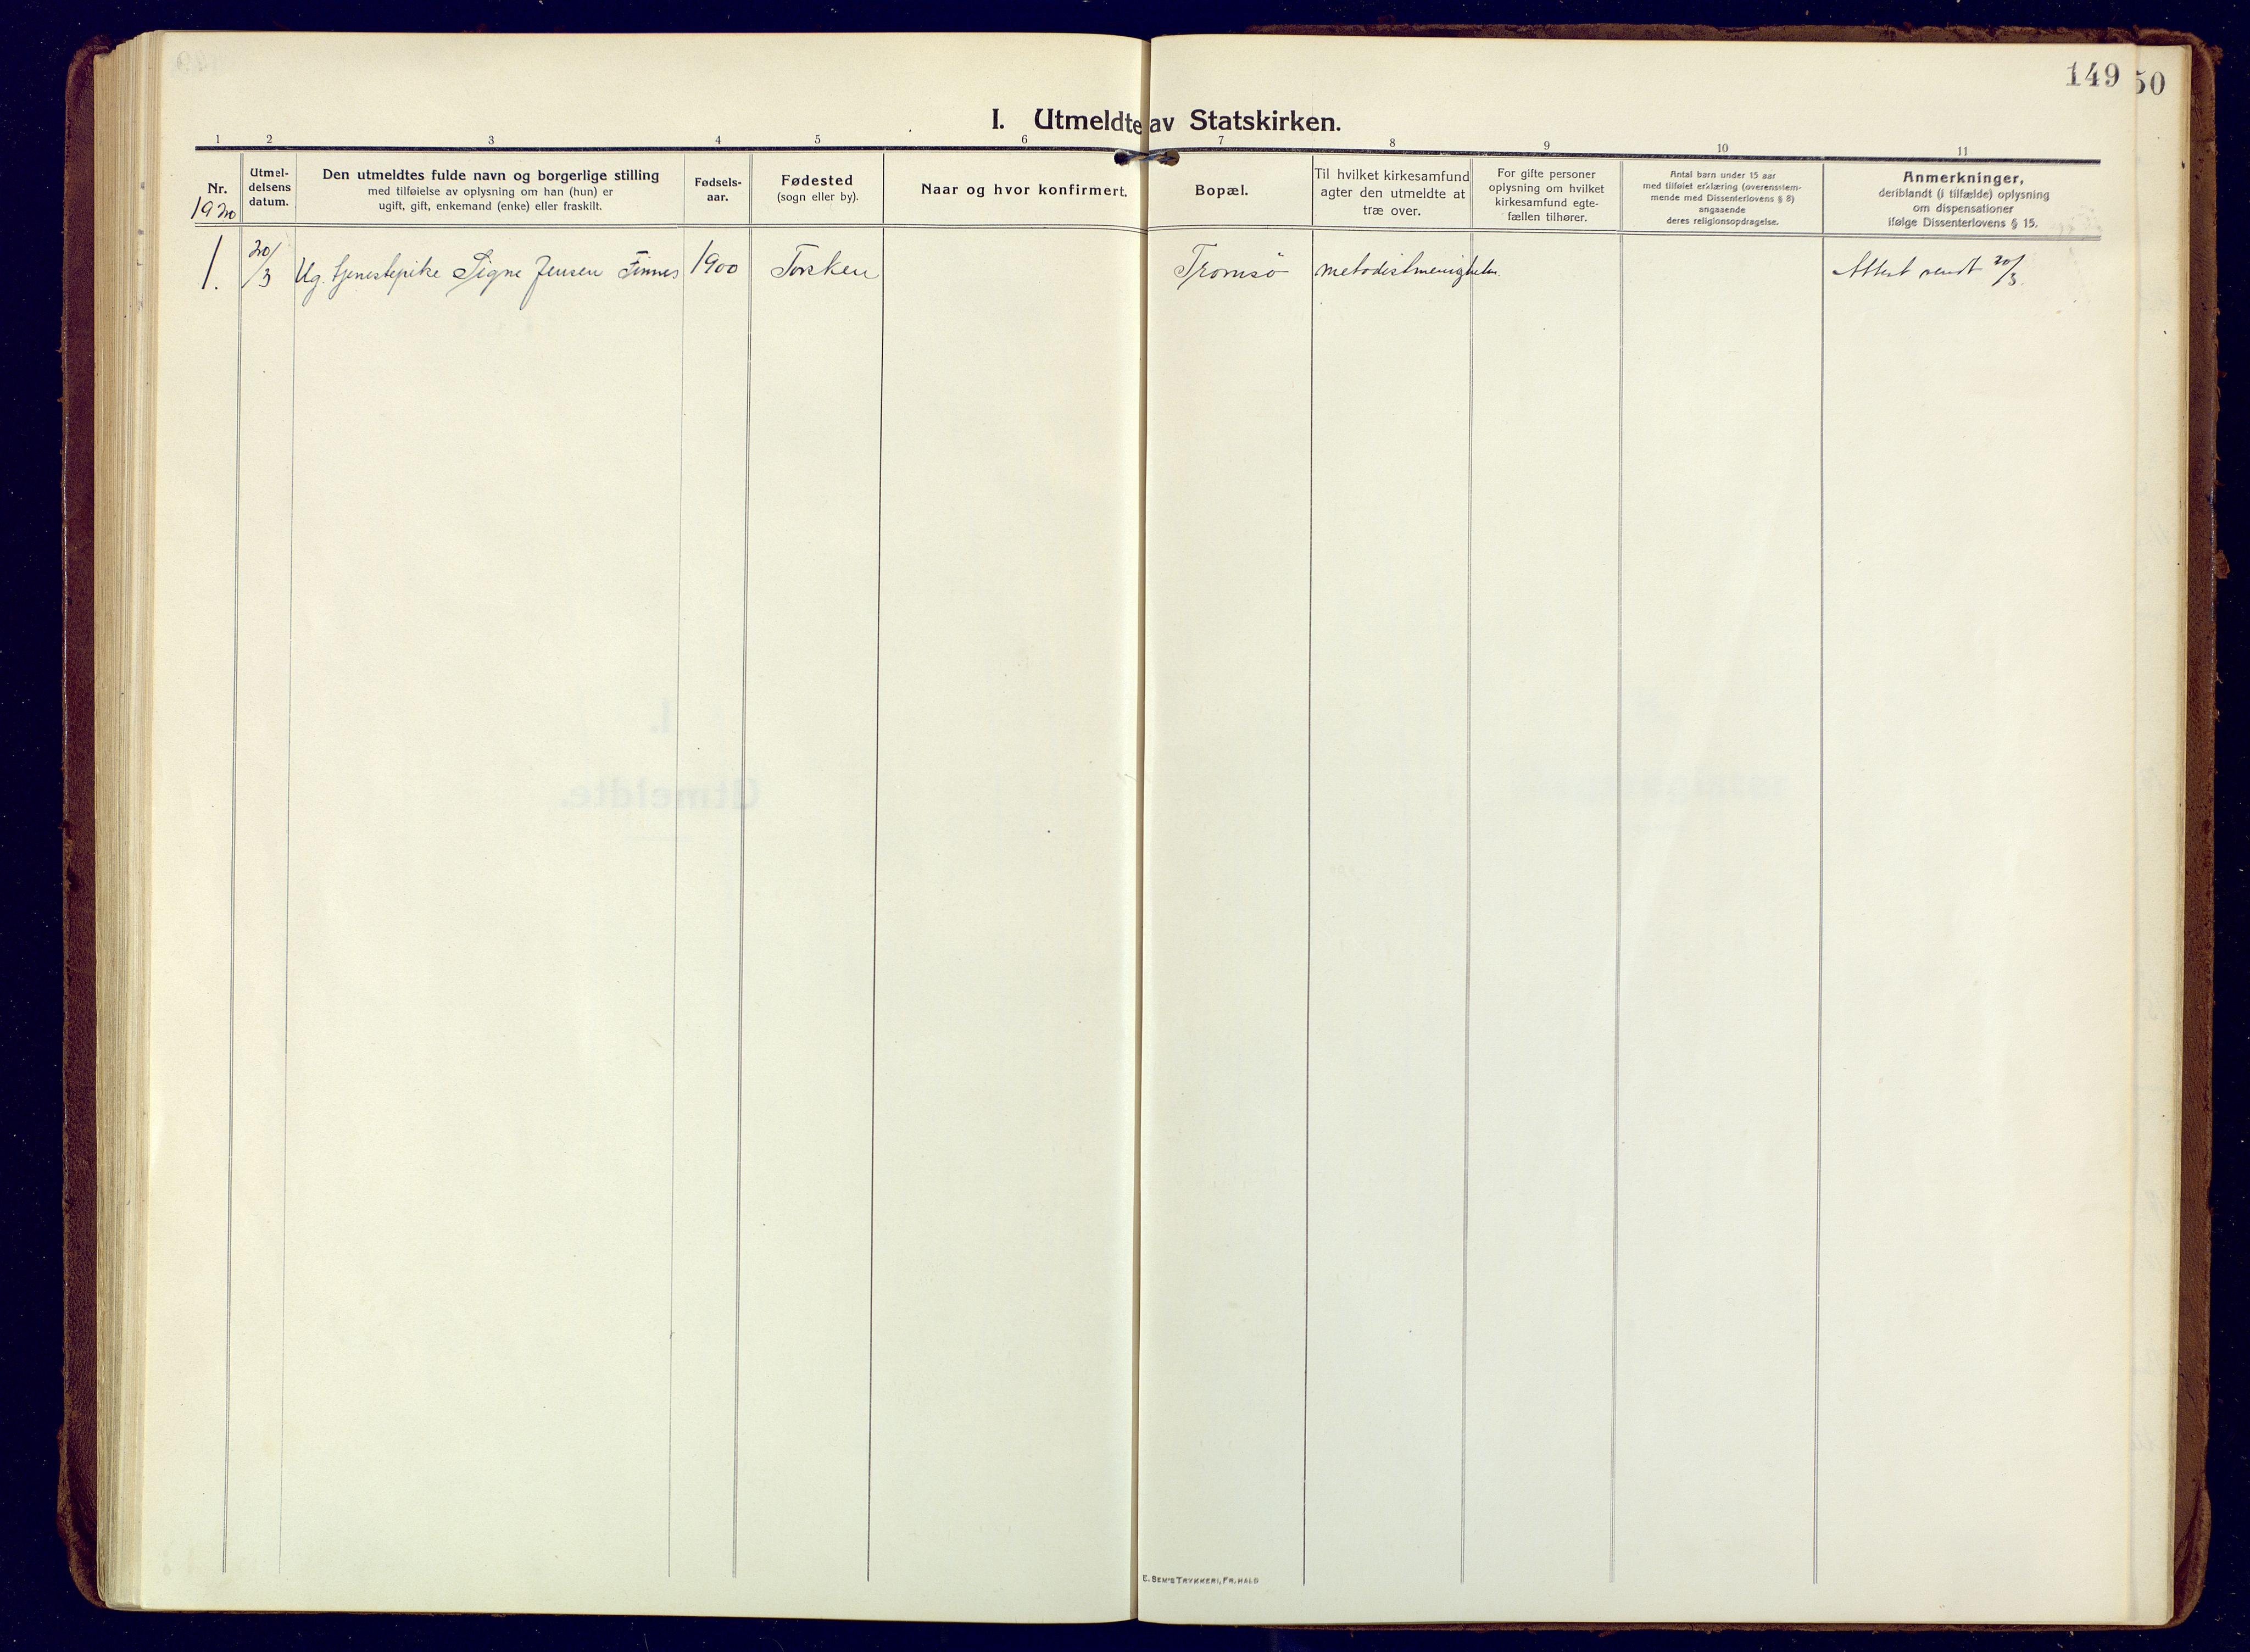 SATØ, Mefjord/Berg sokneprestkontor, G/Ga/Gaa: Ministerialbok nr. 10, 1916-1928, s. 149